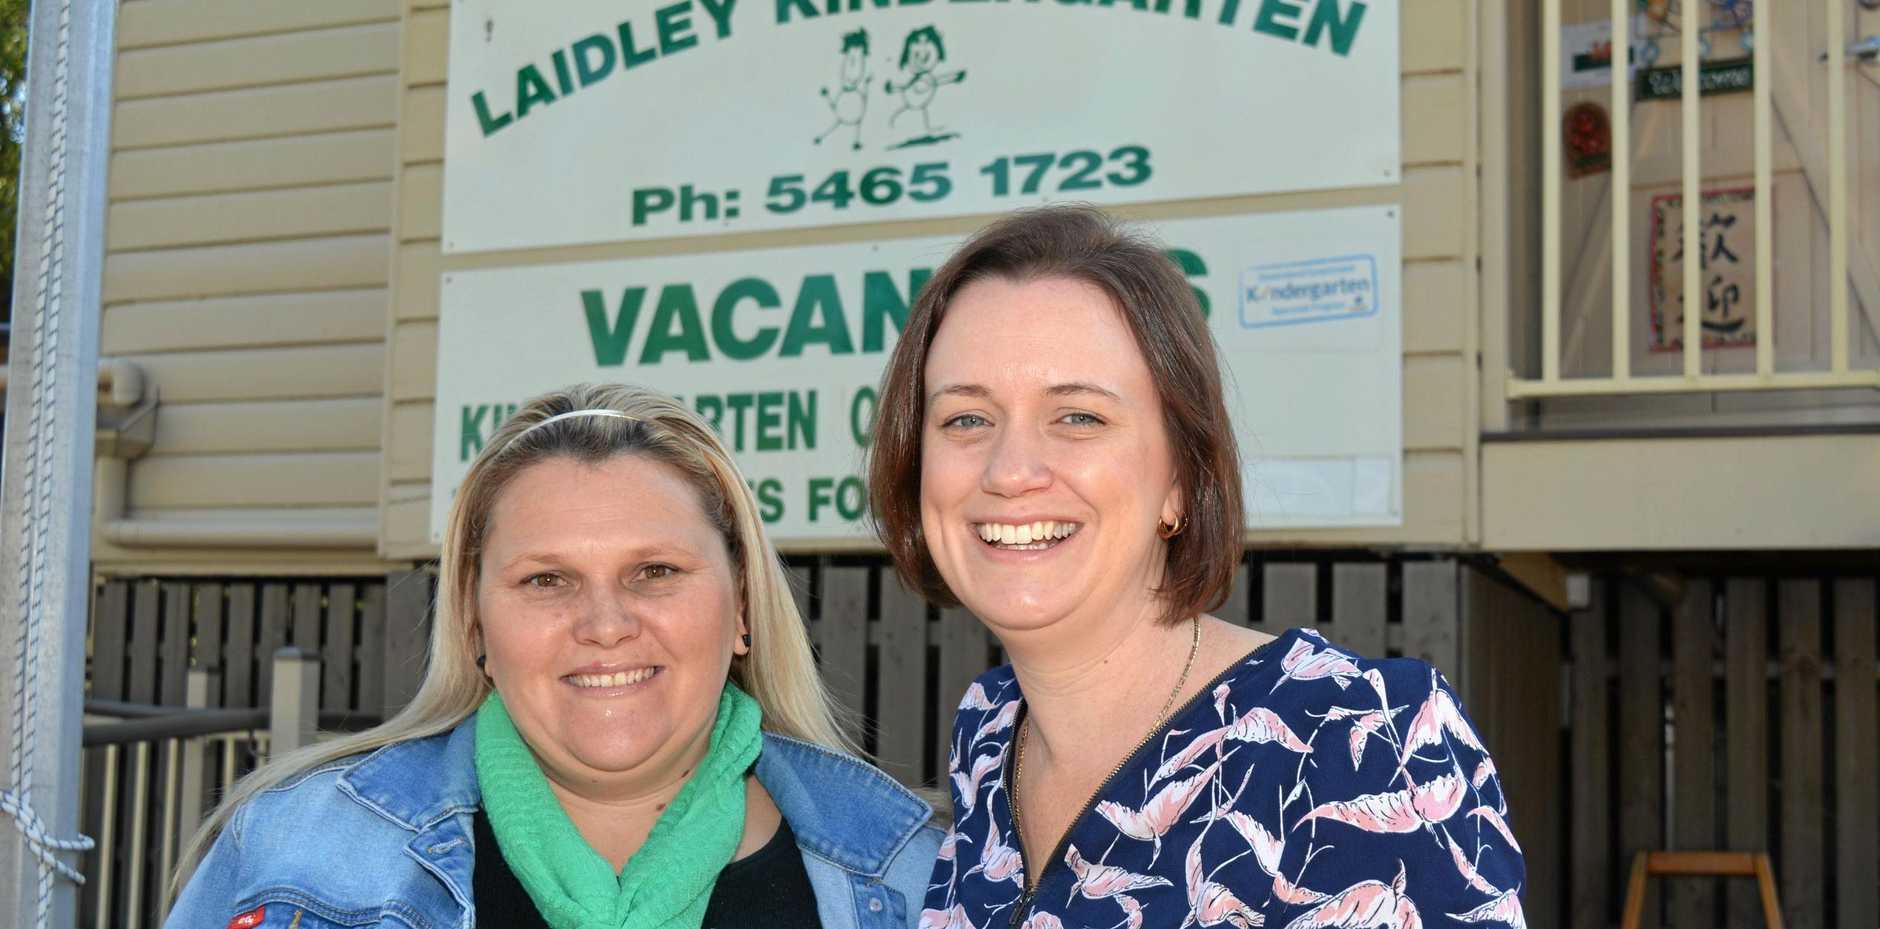 New Laidley Kindy teachers Bianca Beare and Anna Feeny